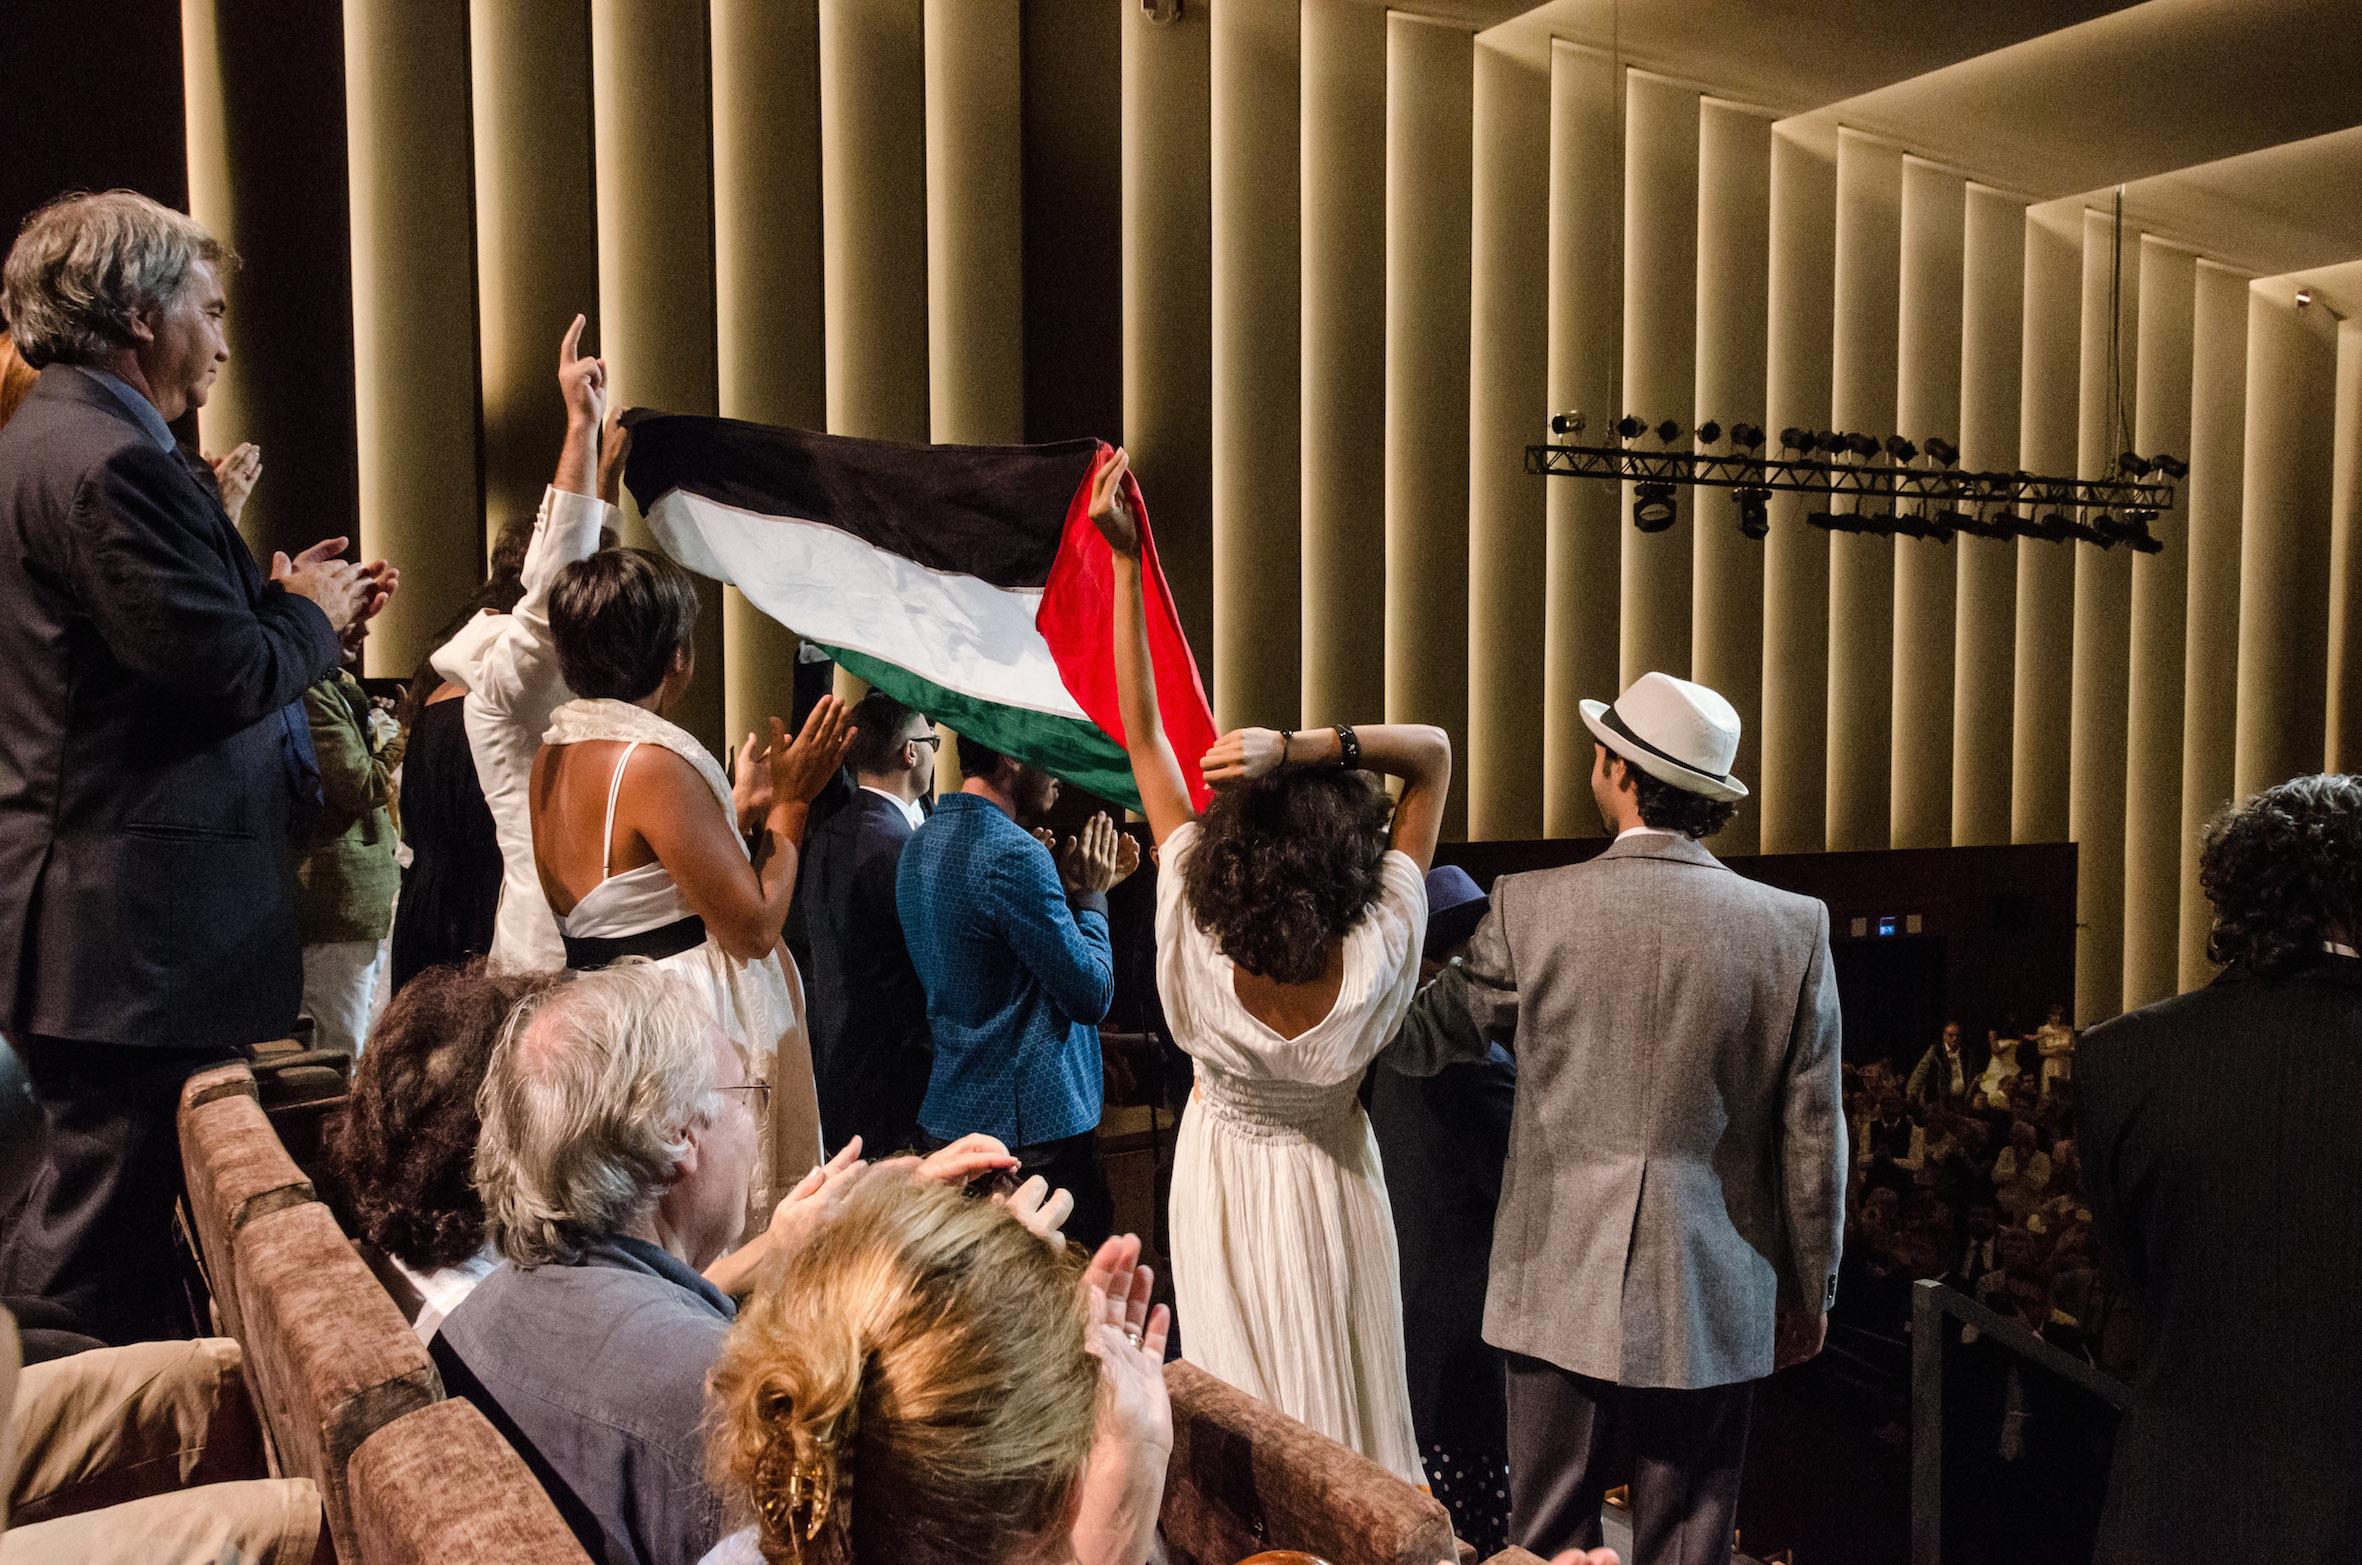 In sala la bandiera palestinese